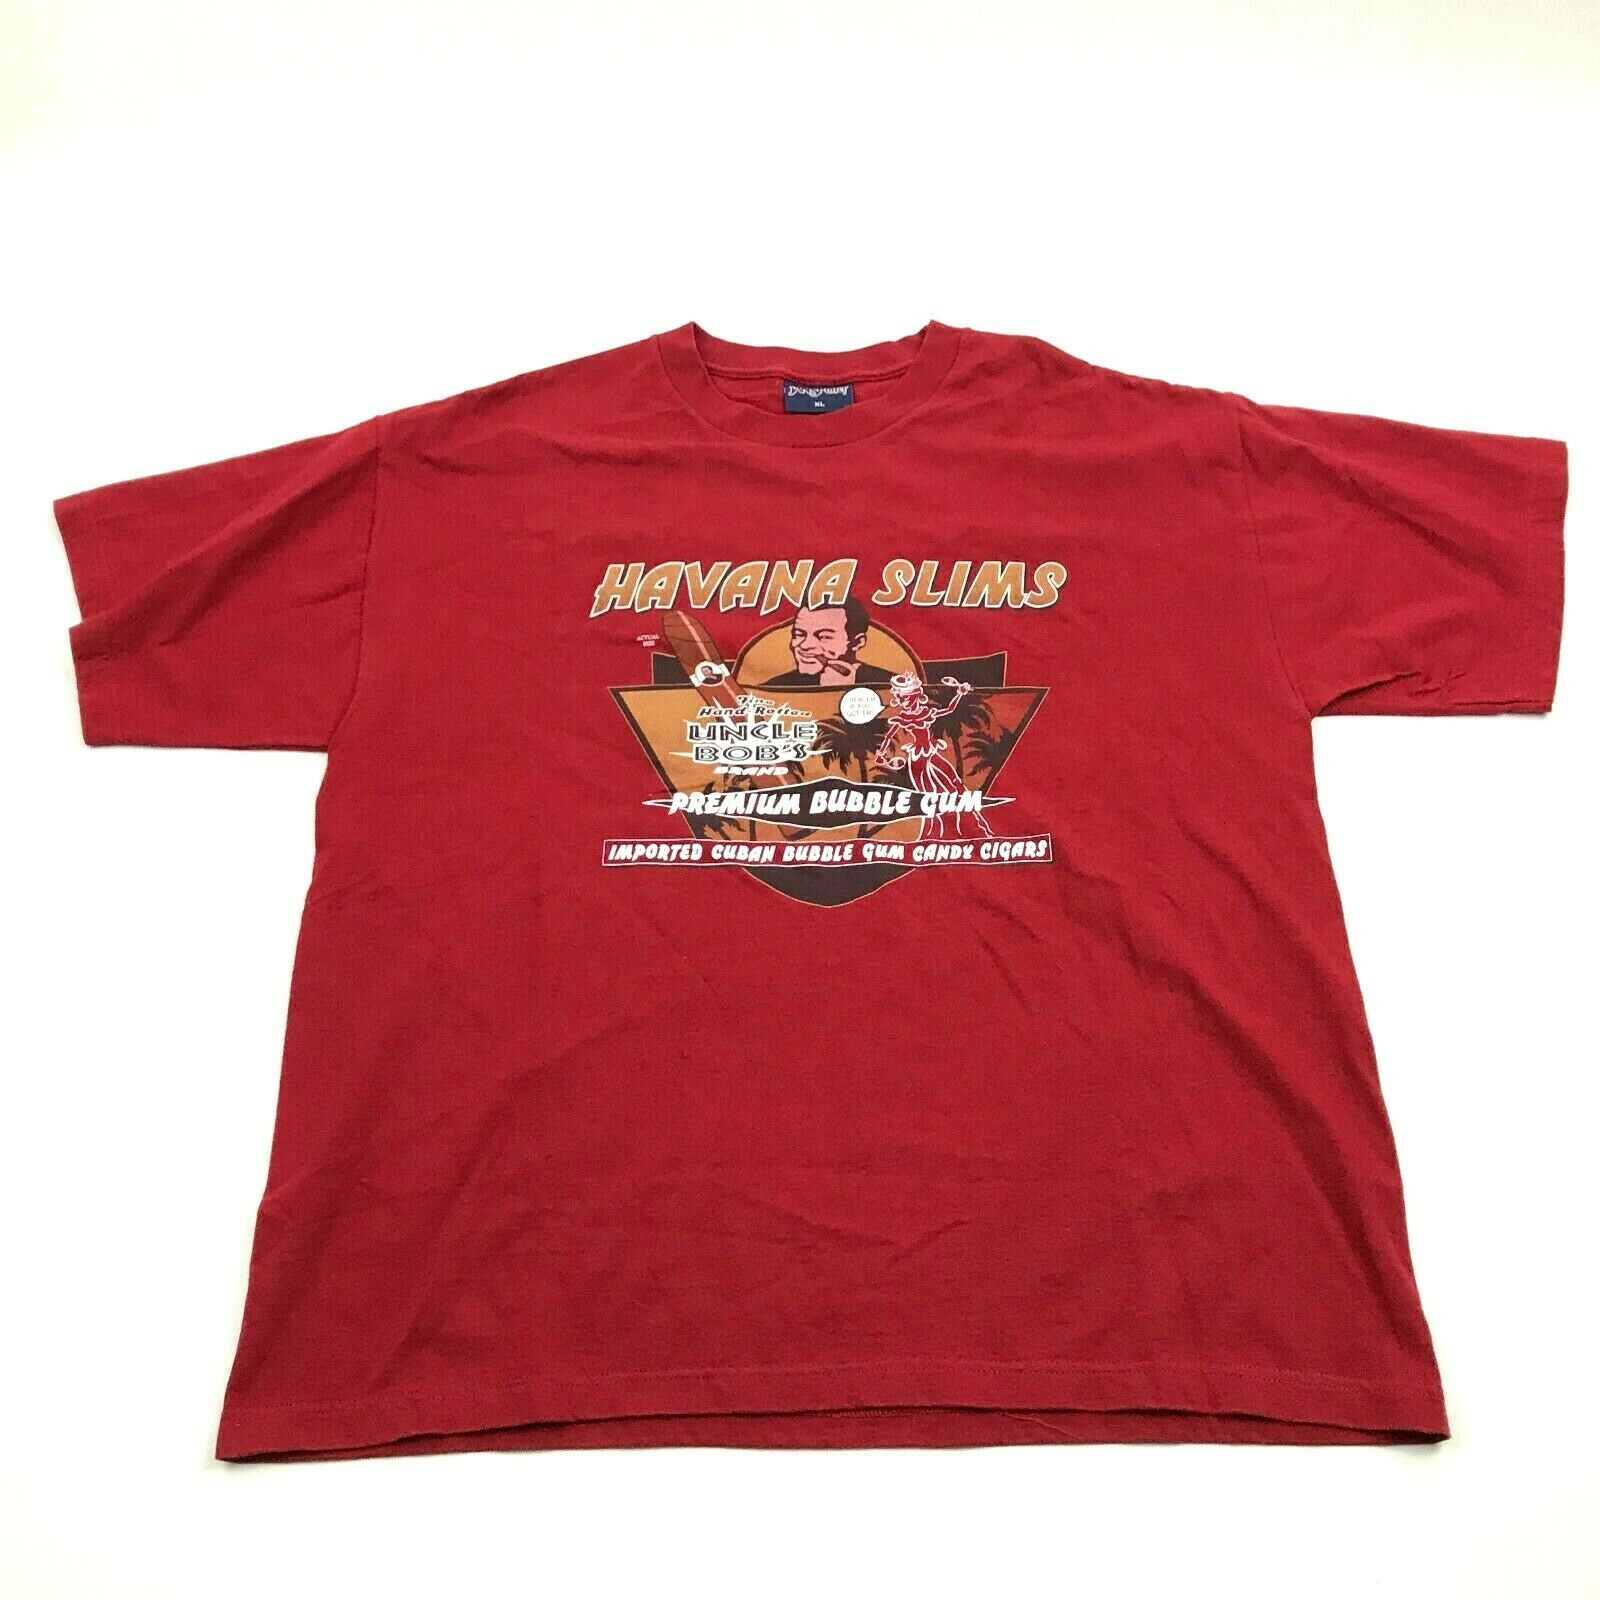 NEW VINTAGE JanSport Havana Slims Bubblegum Cigar Shirt Size XL Extra Large Red - $23.53